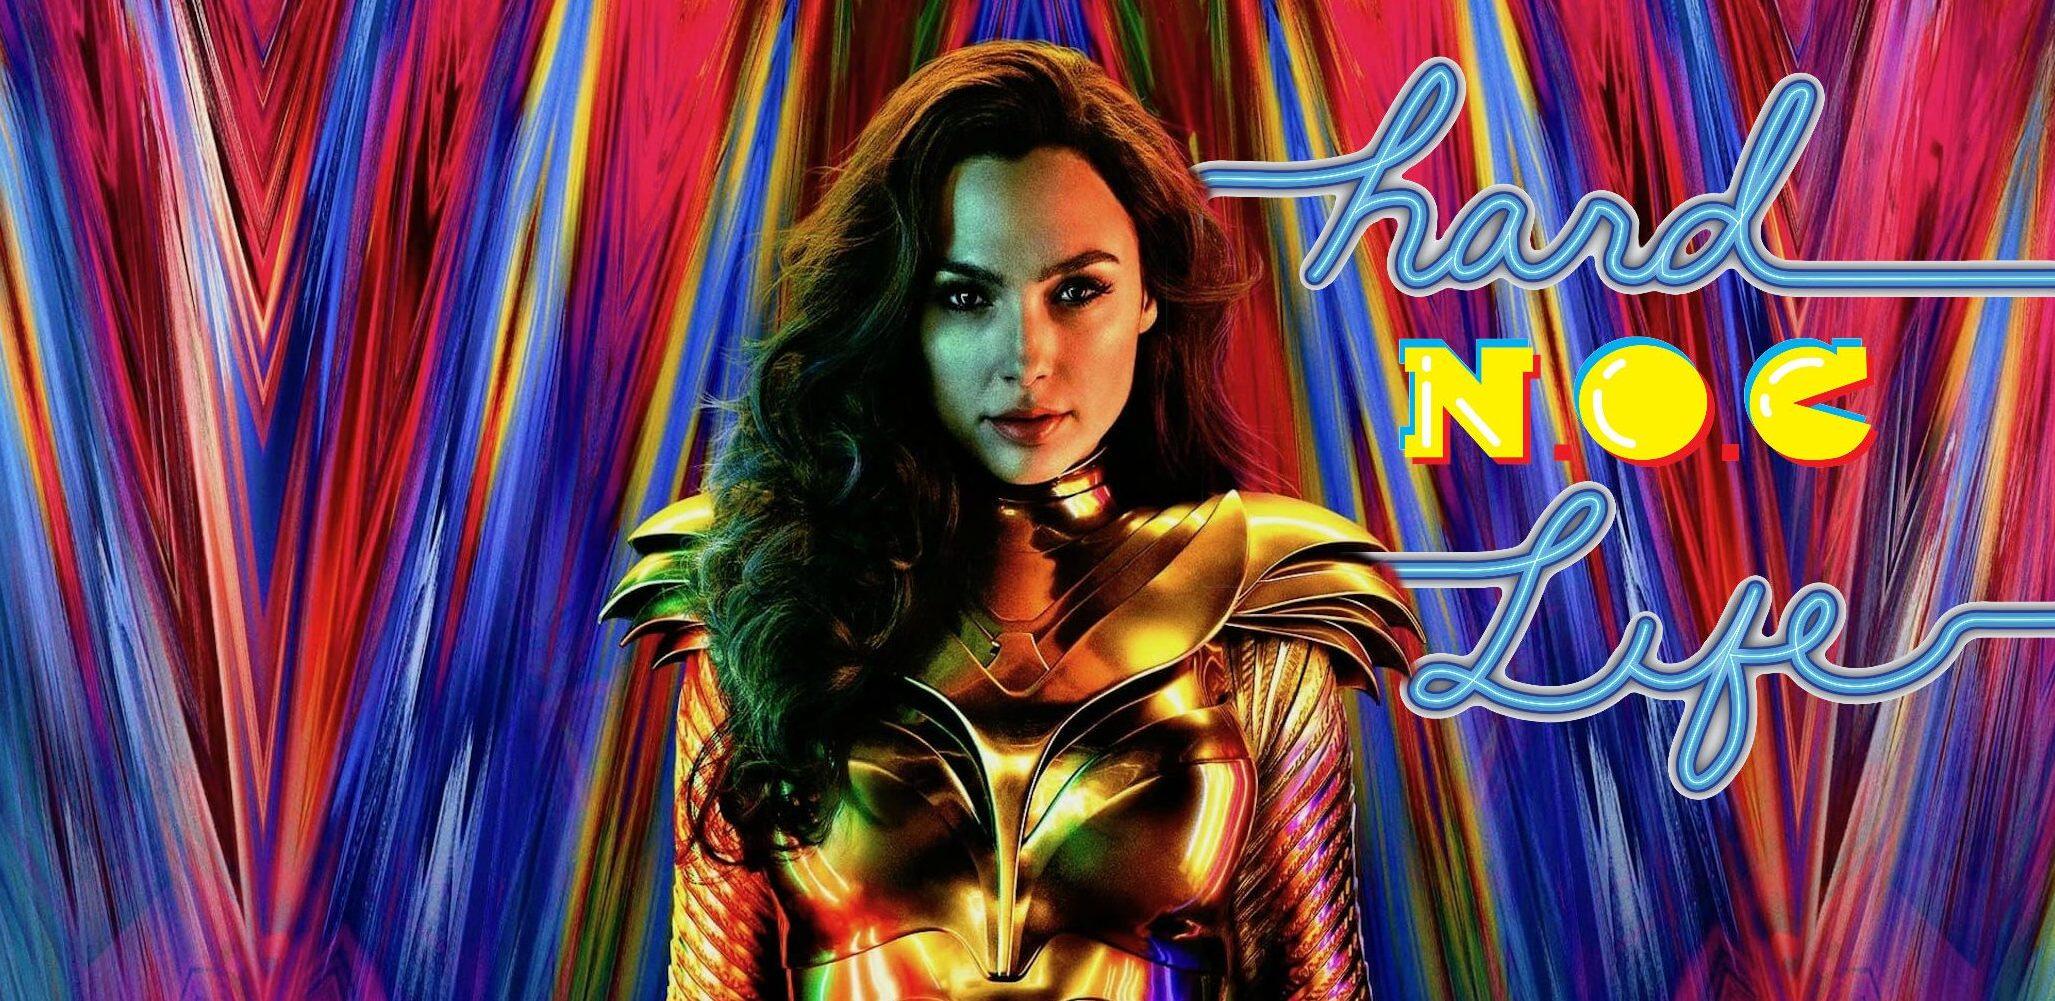 Hard NOC Life: Across the DC Universe